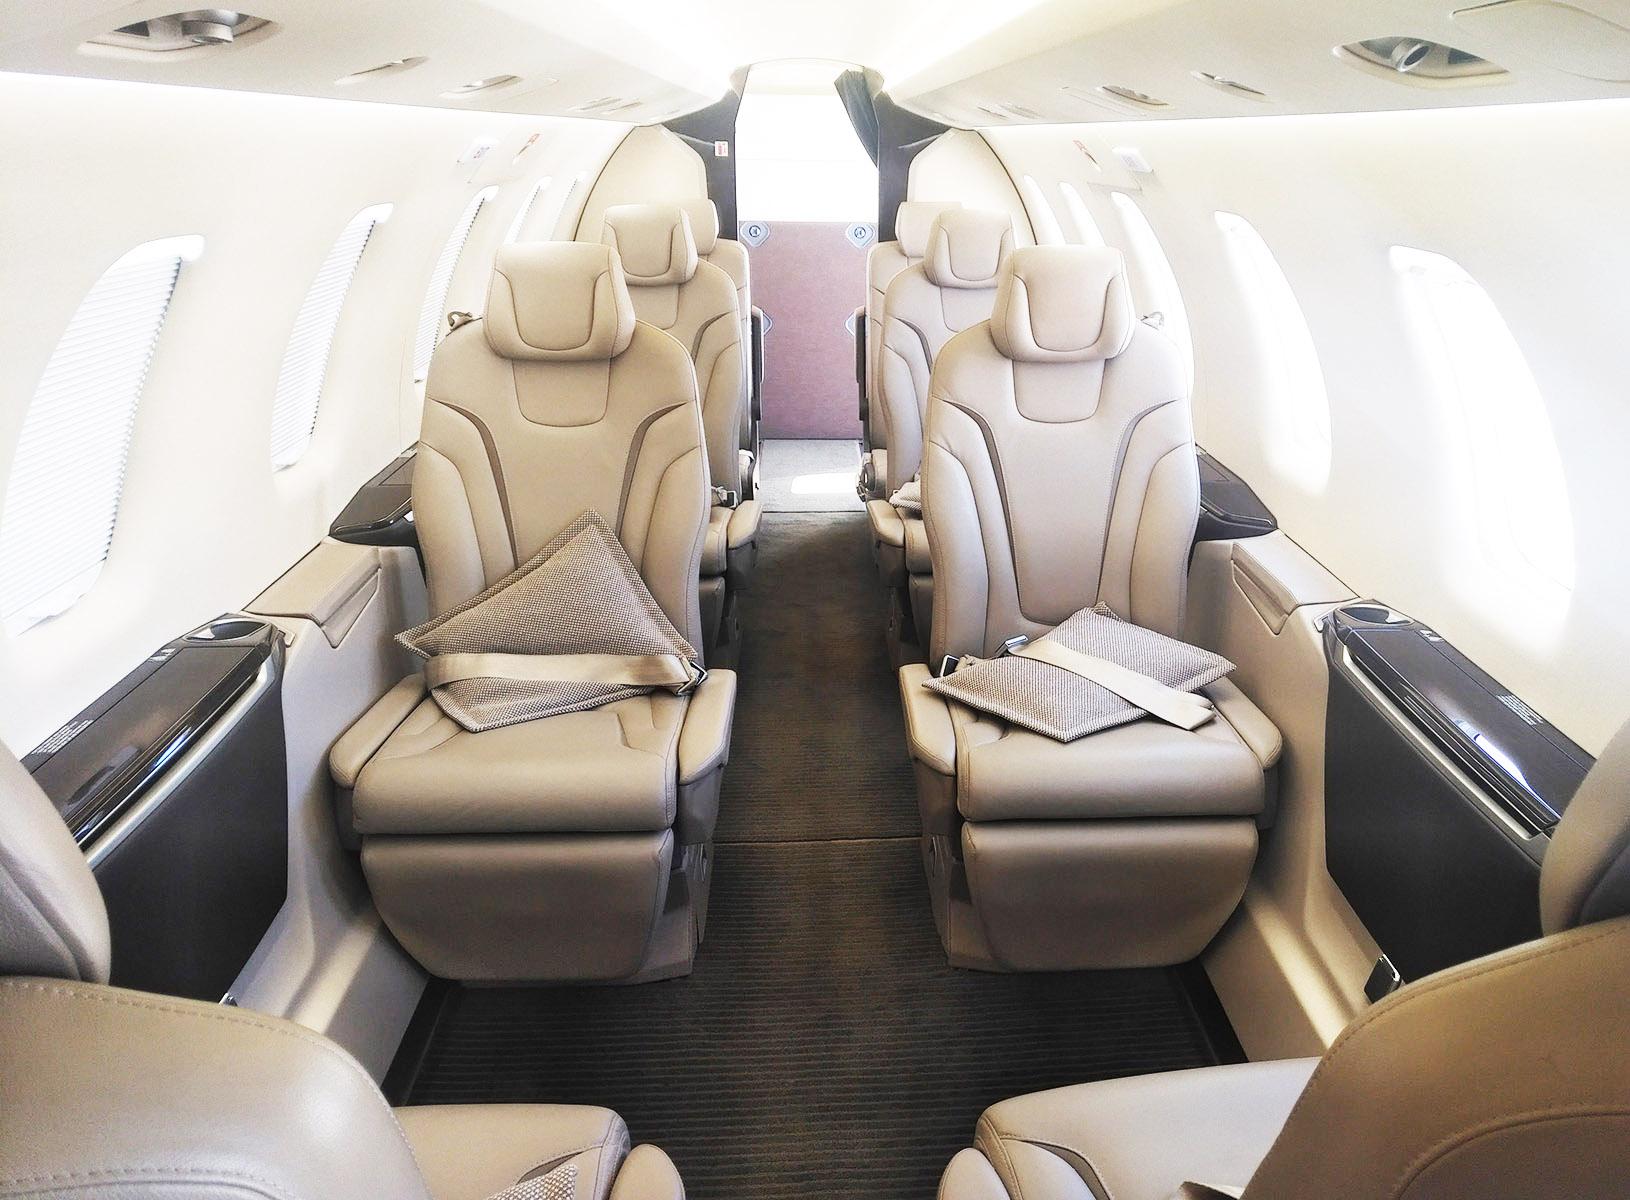 The spacious interior of the Pilatus PC-24